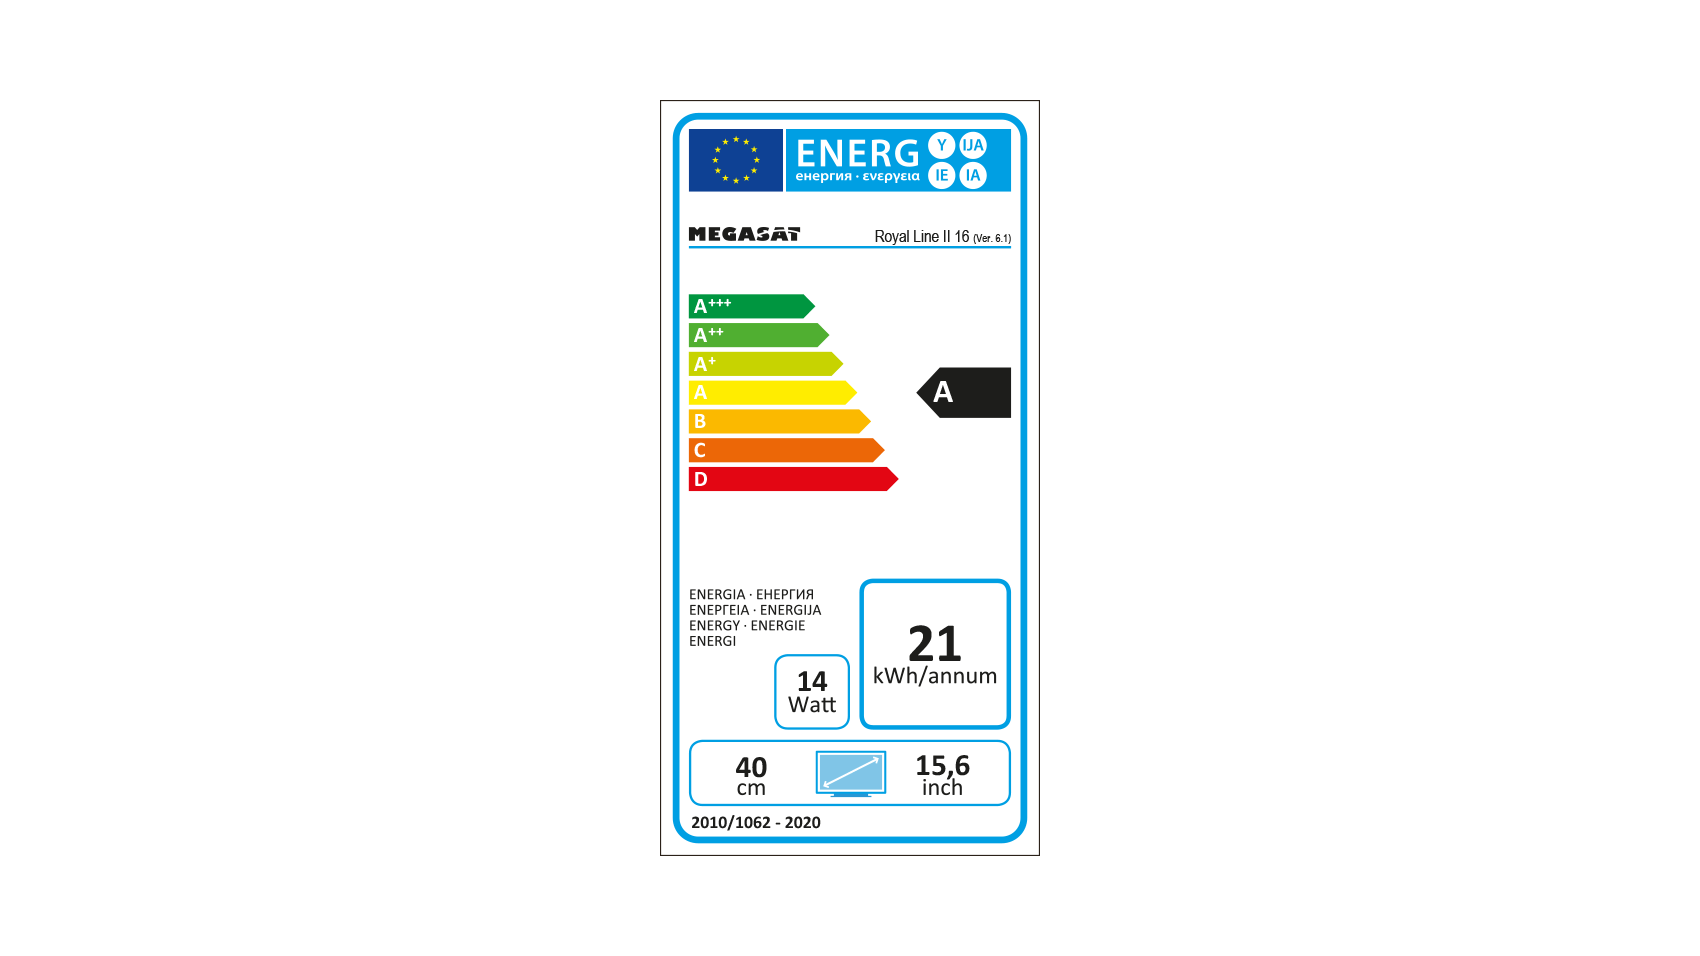 megasat_royal_line_2_16_energielabel-1